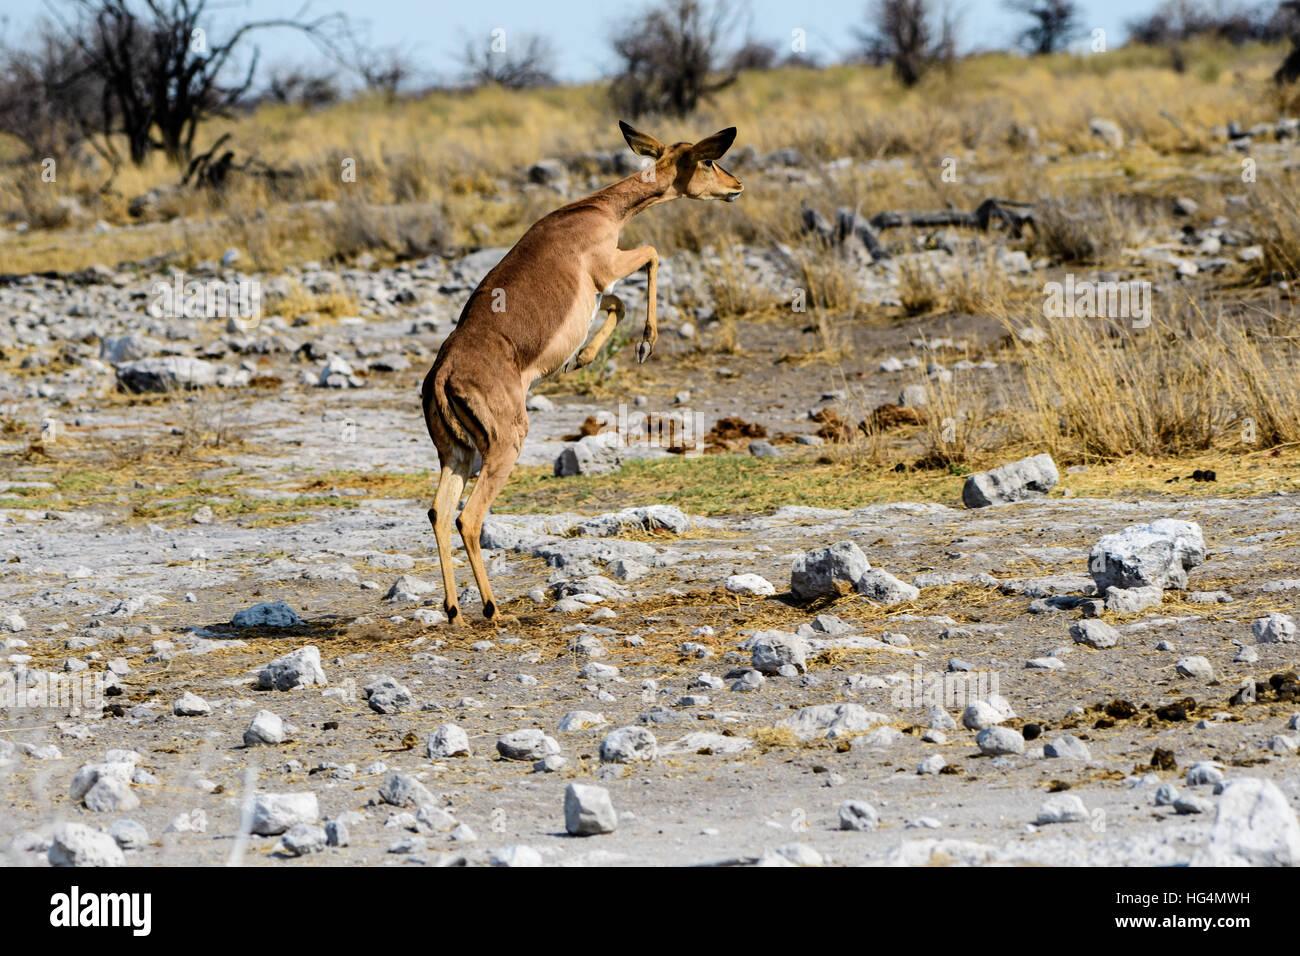 Black faced impala leaping - Stock Image